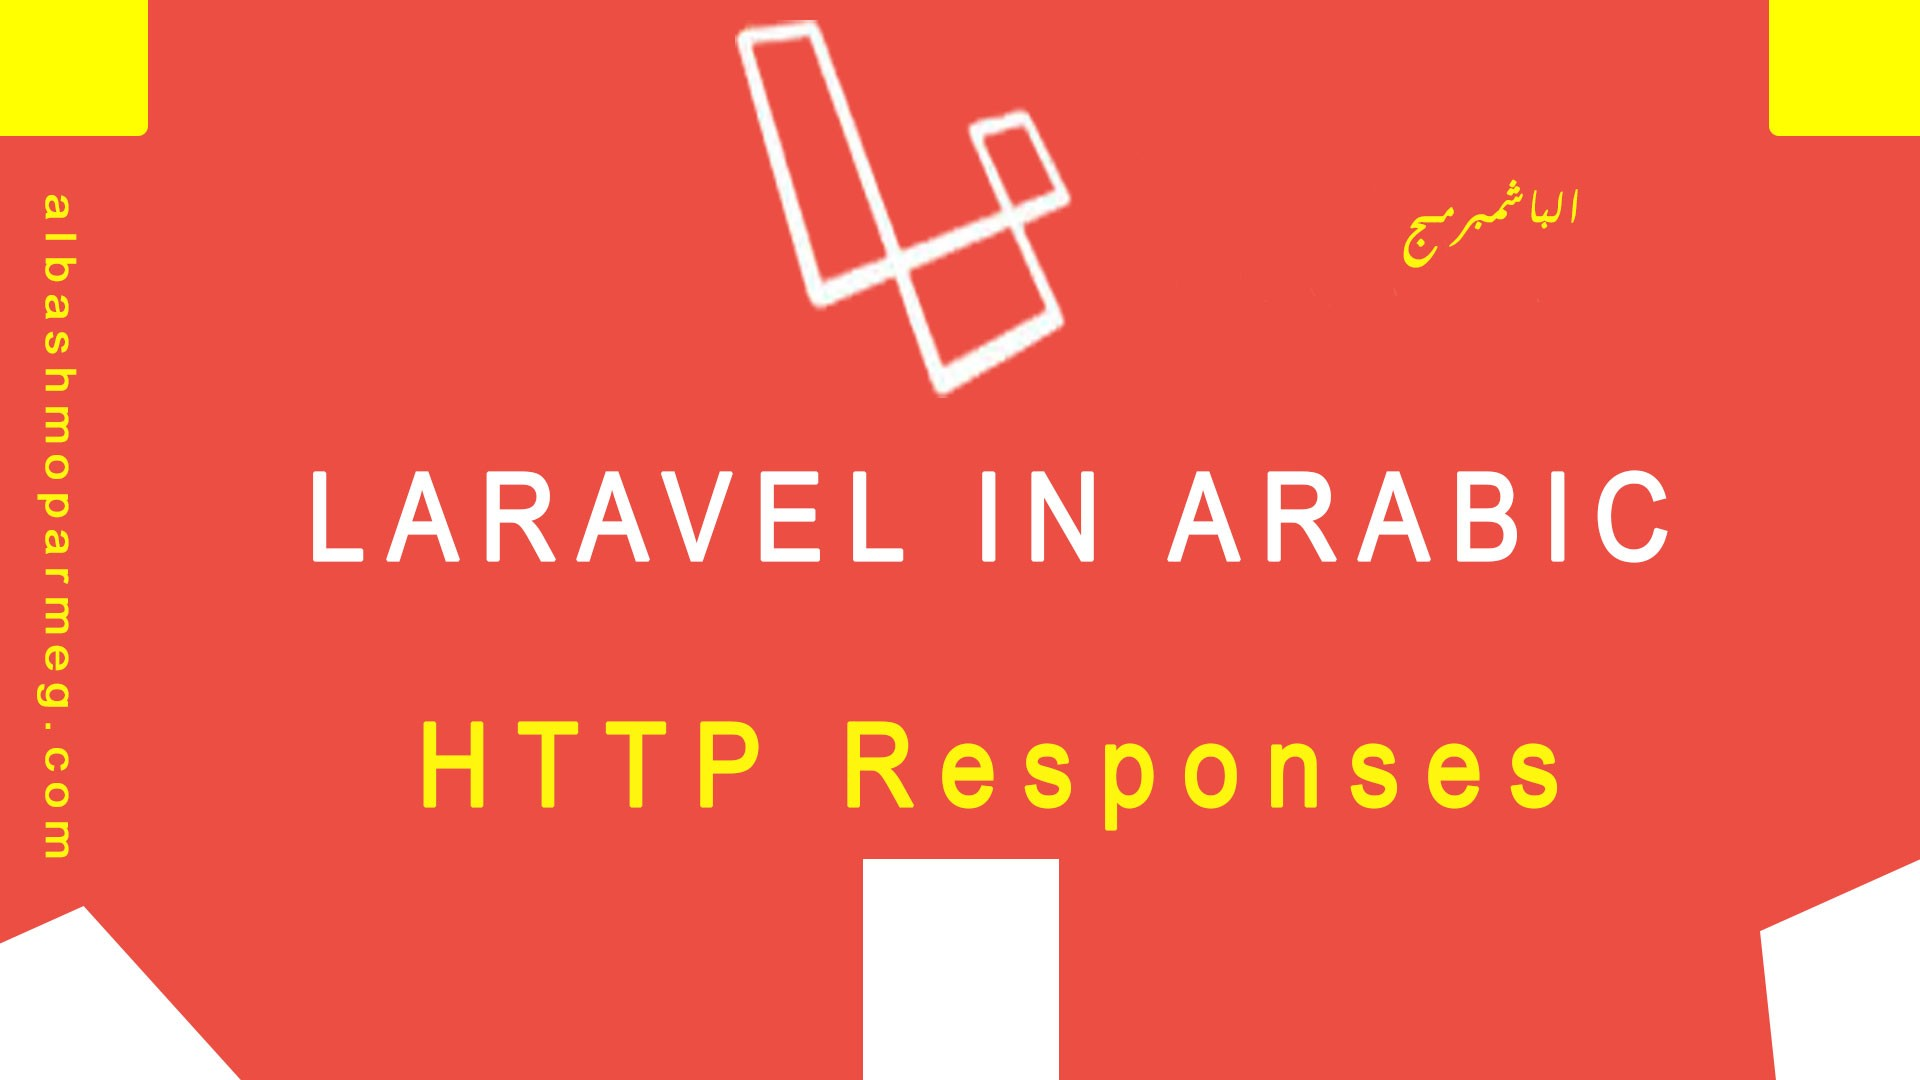 laravel responses